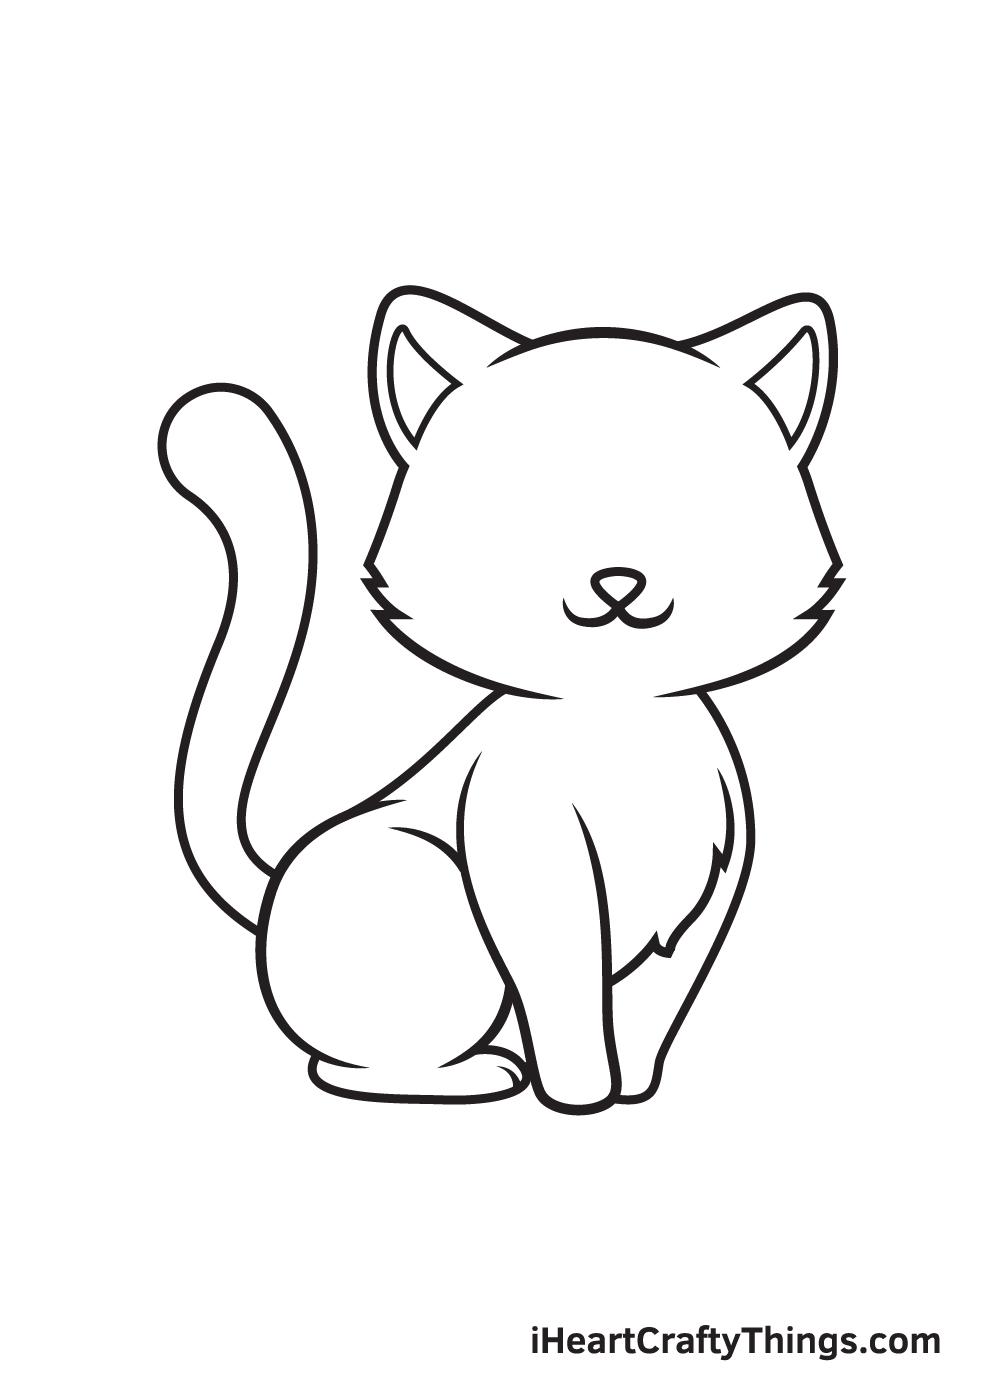 Kitten Drawing – Step 8